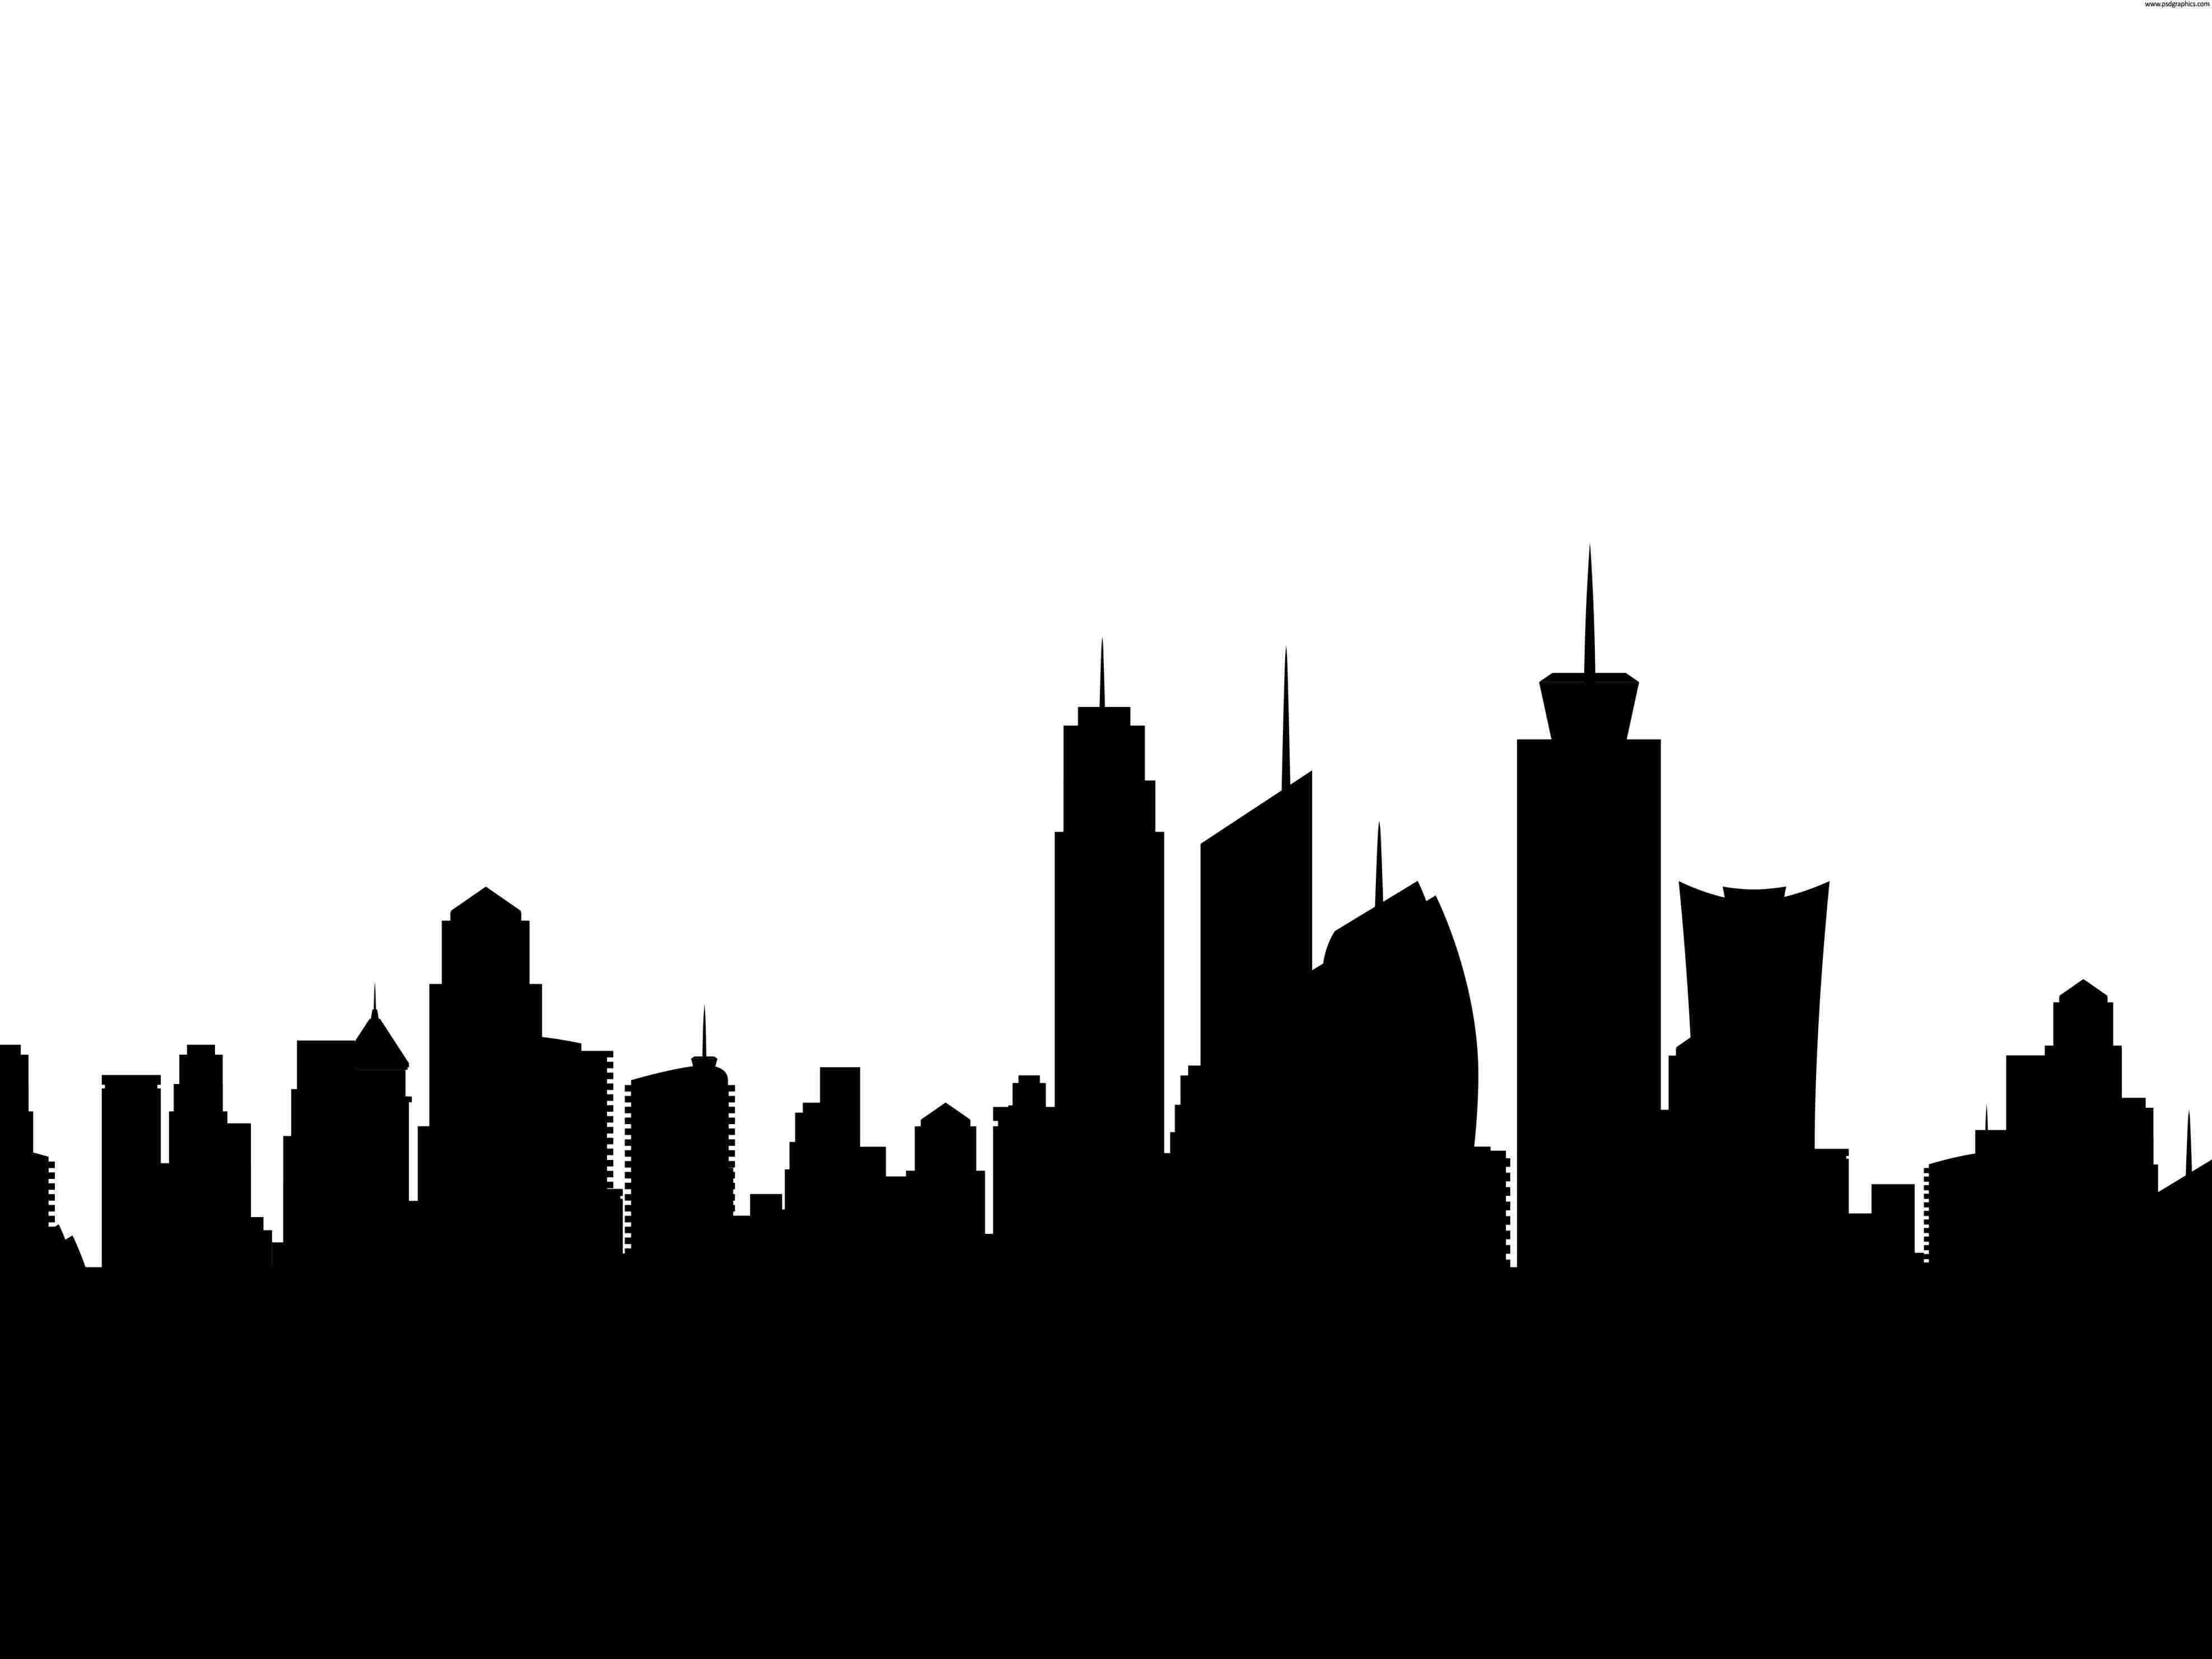 3950x2962 Illustration Ny Rhcom Images City Skyline Drawing Cute